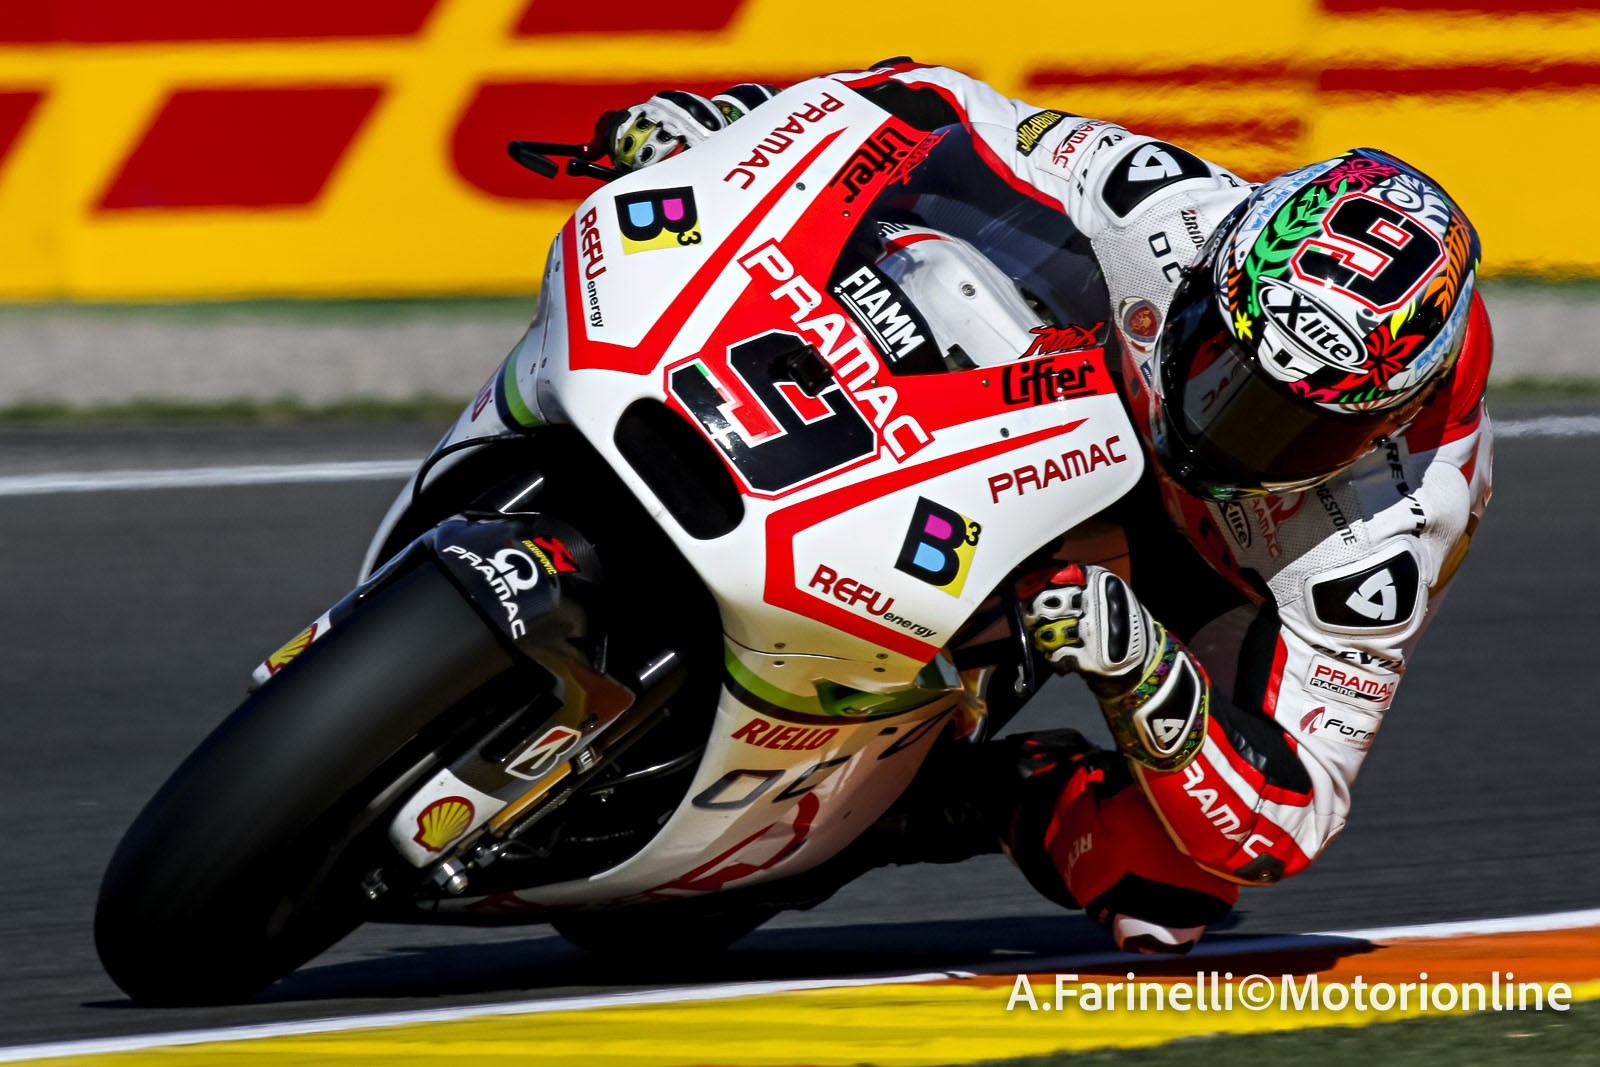 Valencia Moto Gp | MotoGP 2017 Info, Video, Points Table